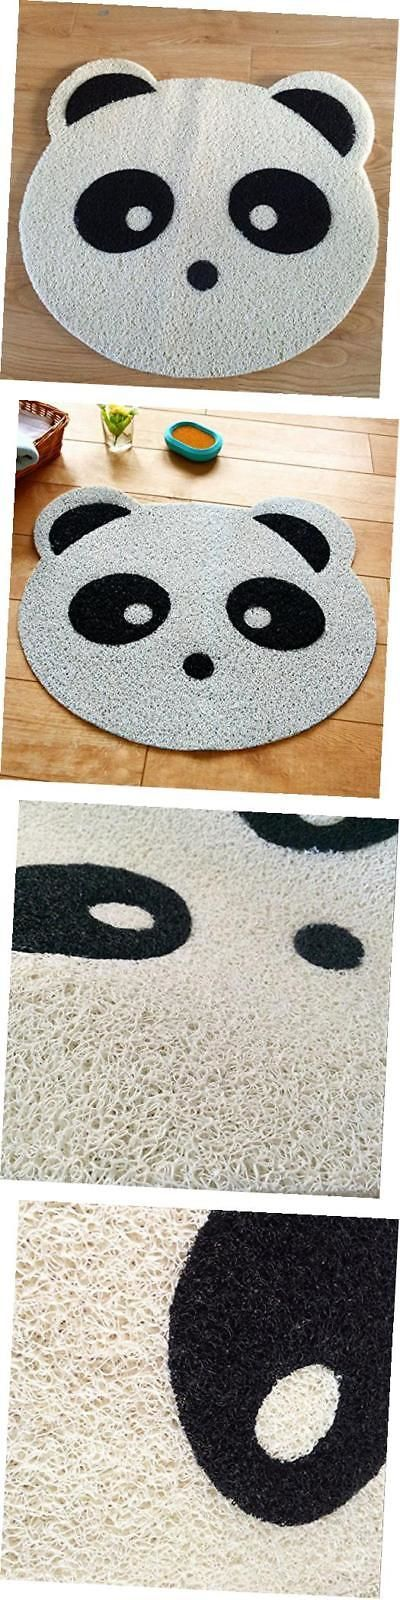 Non-Slip Appliques and Mats 66722: Anti-Skid Pvc Kids Bath Rug Cute Panda Massage Mat Cartoon Kids Shower Mat -> BUY IT NOW ONLY: $40.31 on eBay!